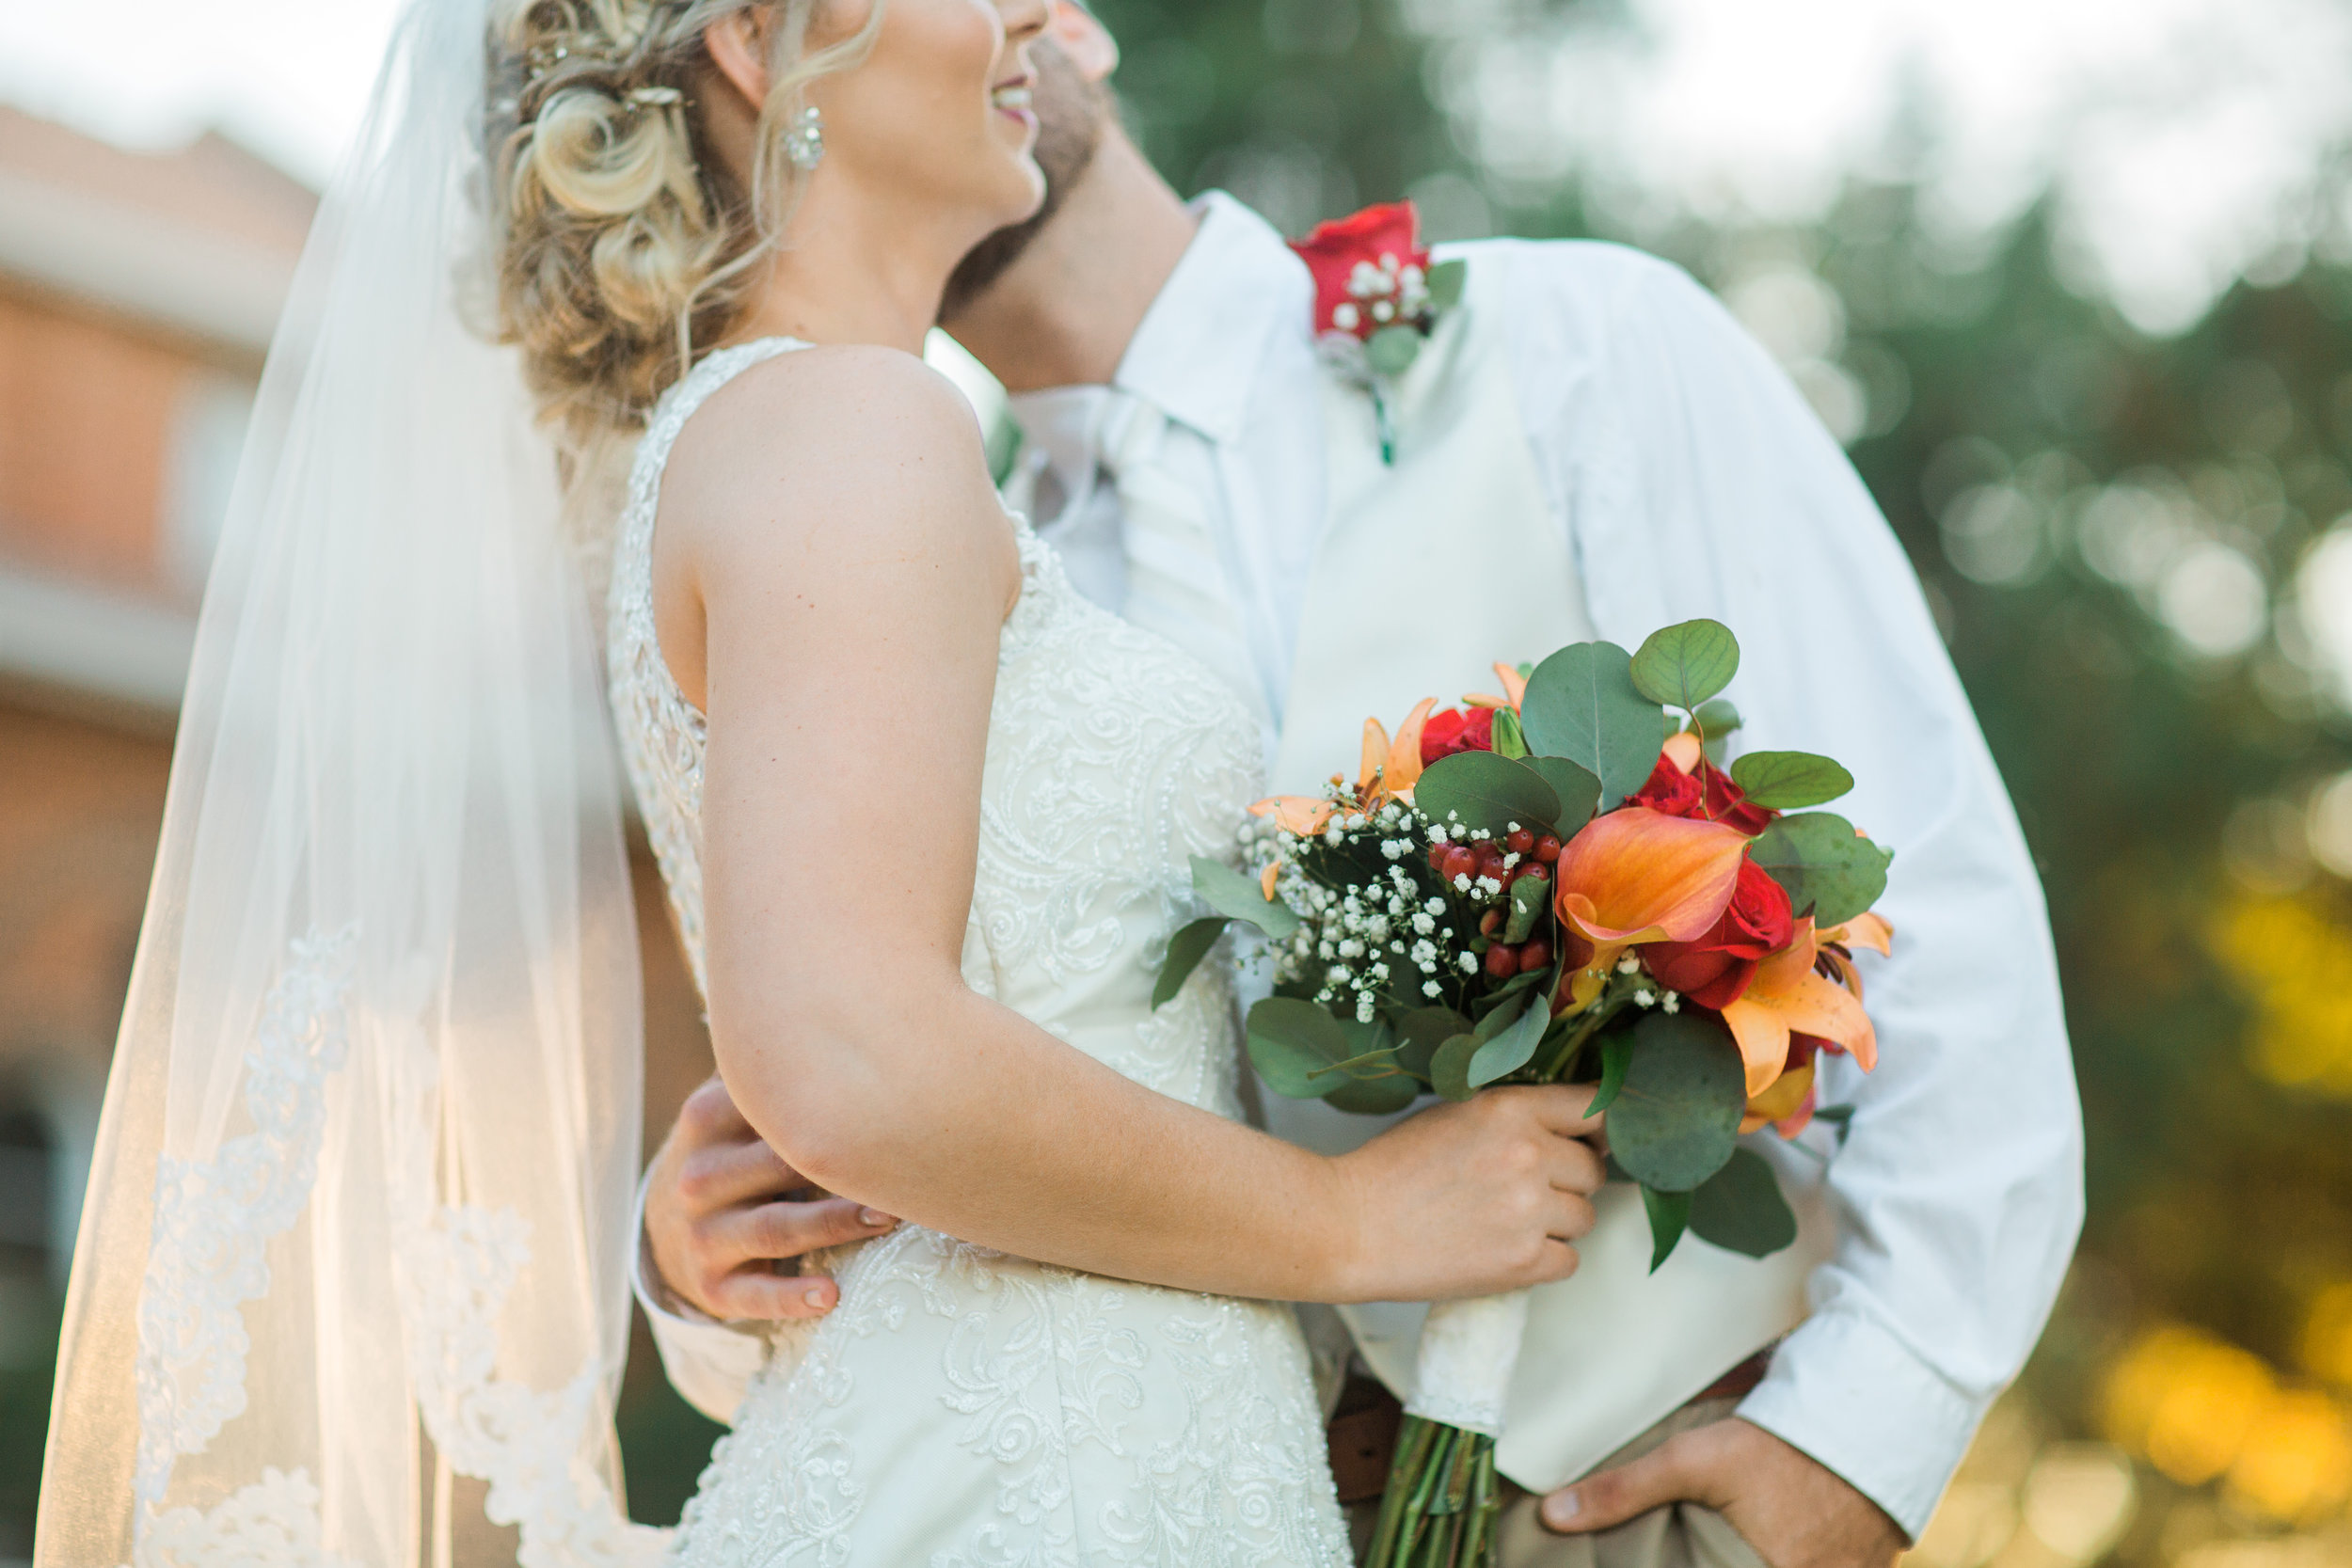 Bailey-Nathan-Windthorst-Texas-Wedding-052.jpg